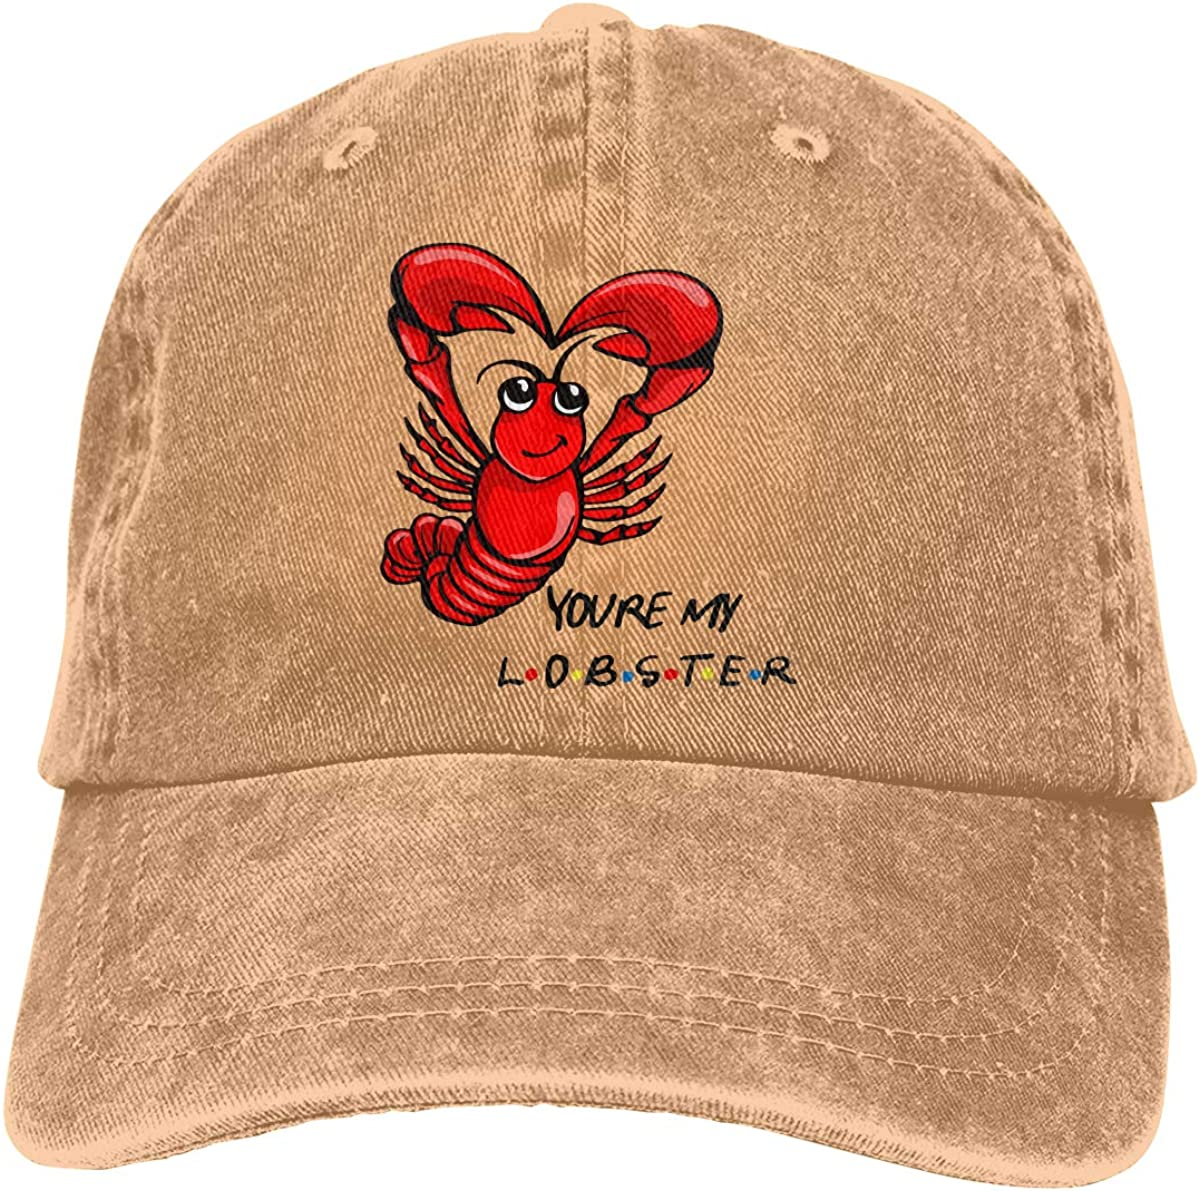 TBVS 77 Men Women Adjustable Cotton Denim Baseball Cap Youre My Lobster Hiphop Cap